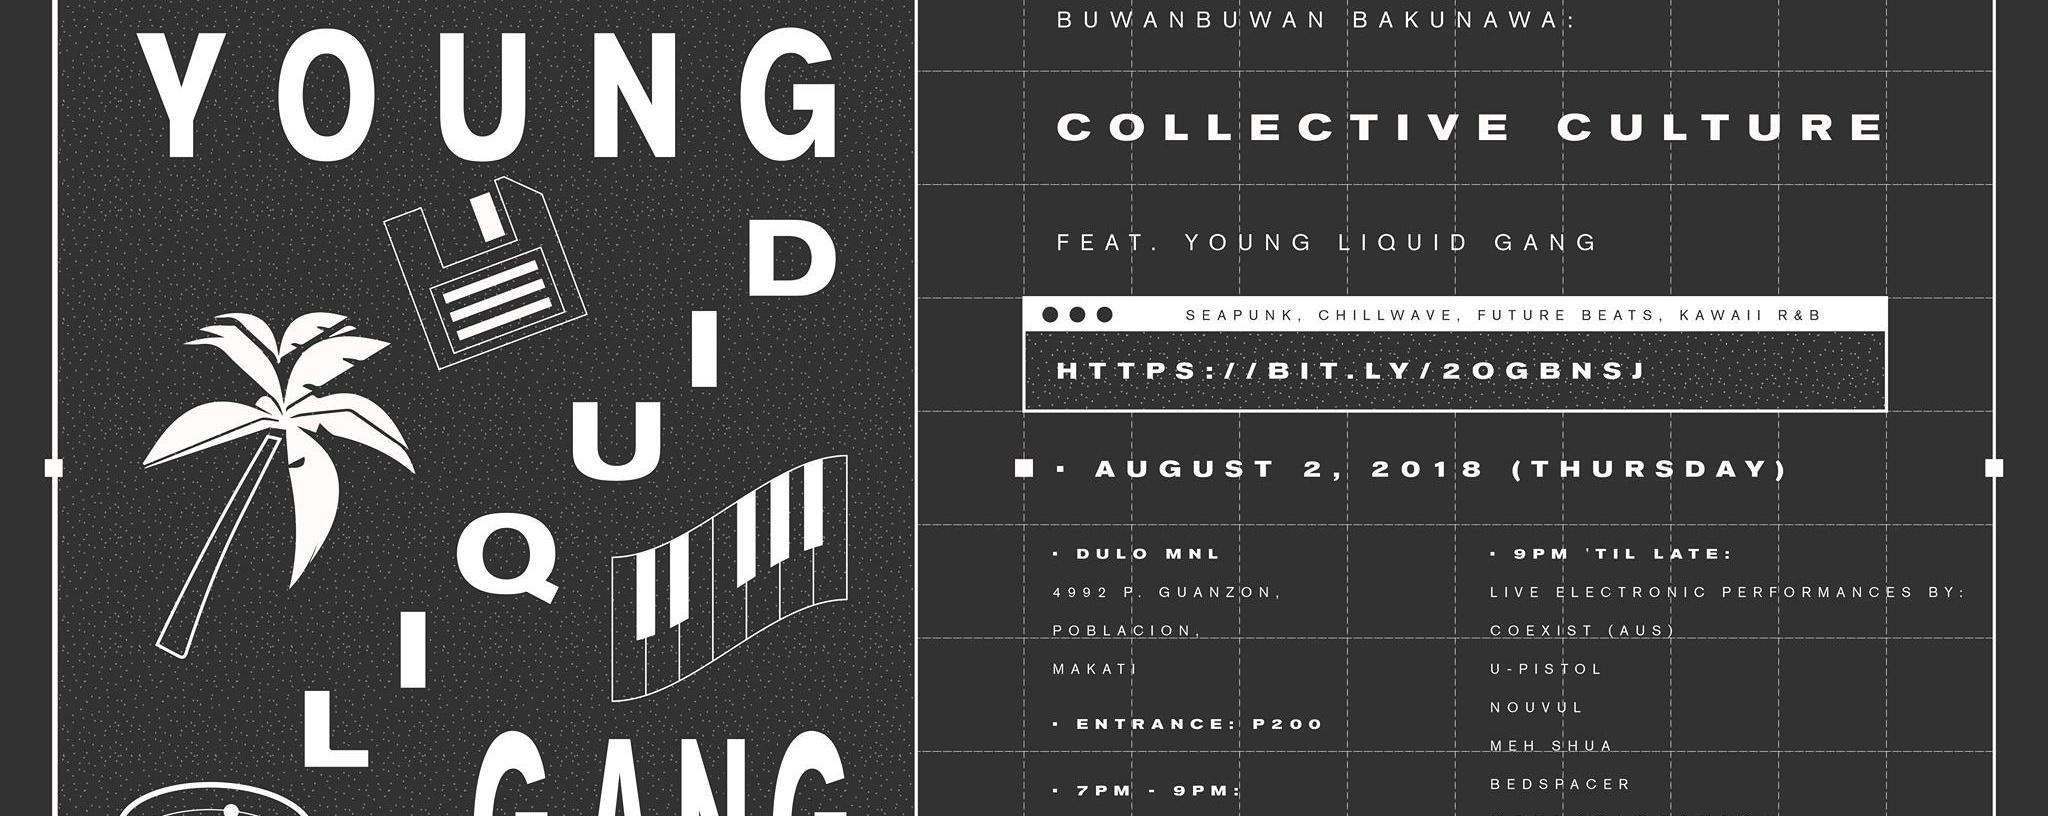 BuwanBuwan Bakunawa: Collective Culture feat. Young Liquid Gang